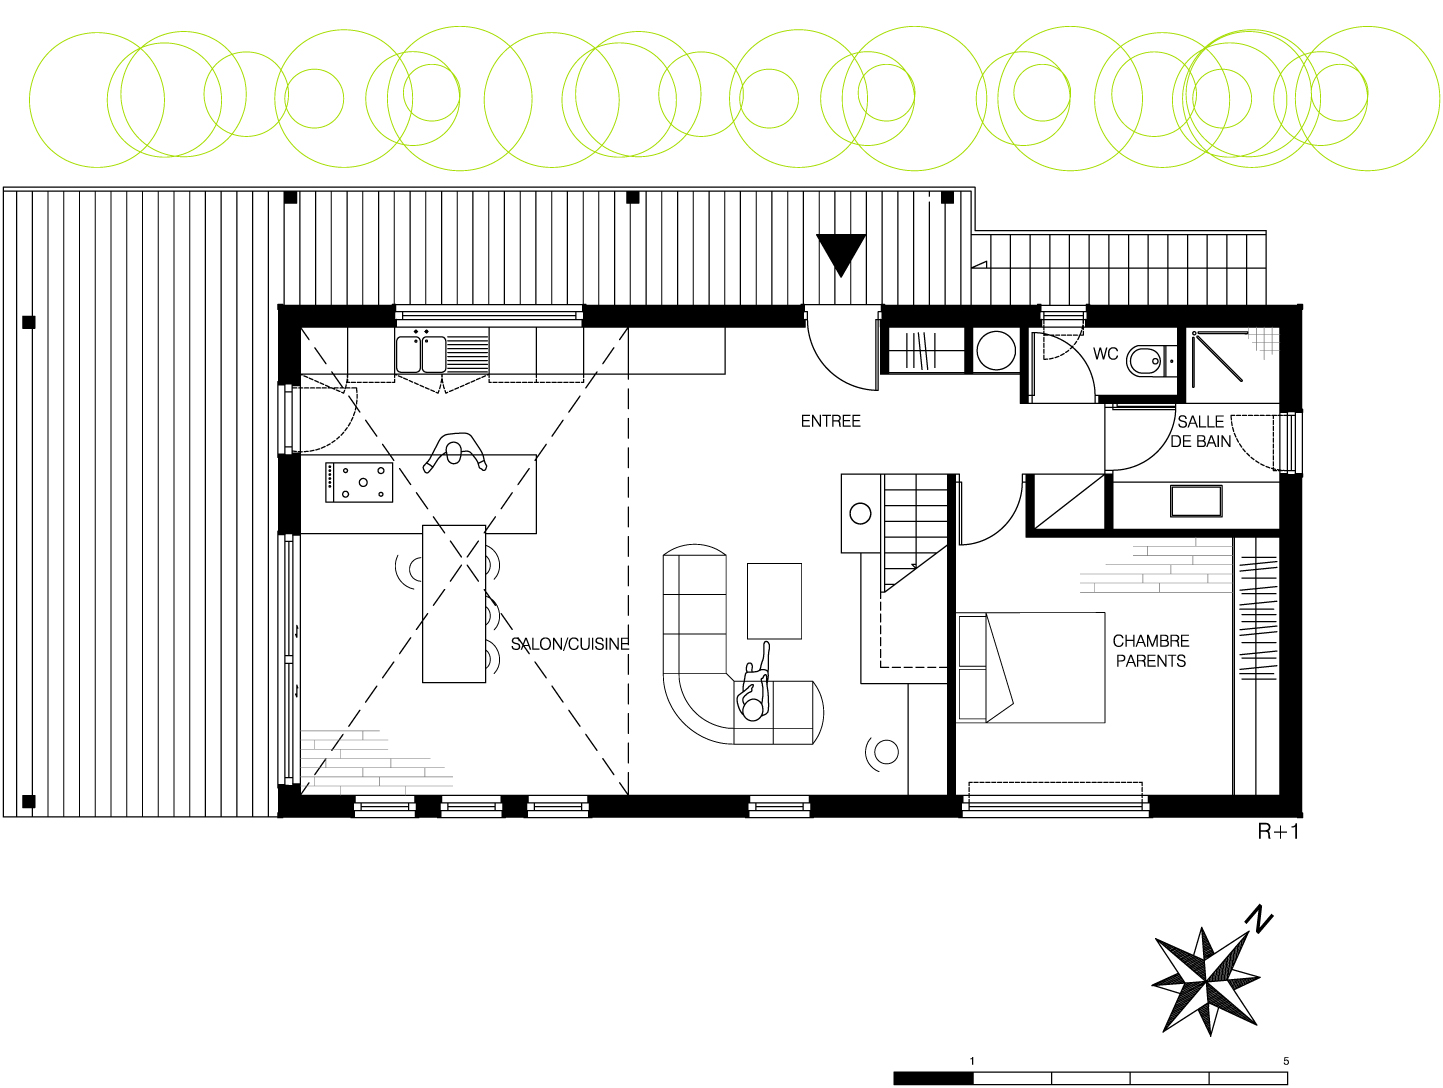 carbonwood plan r+1.jpg